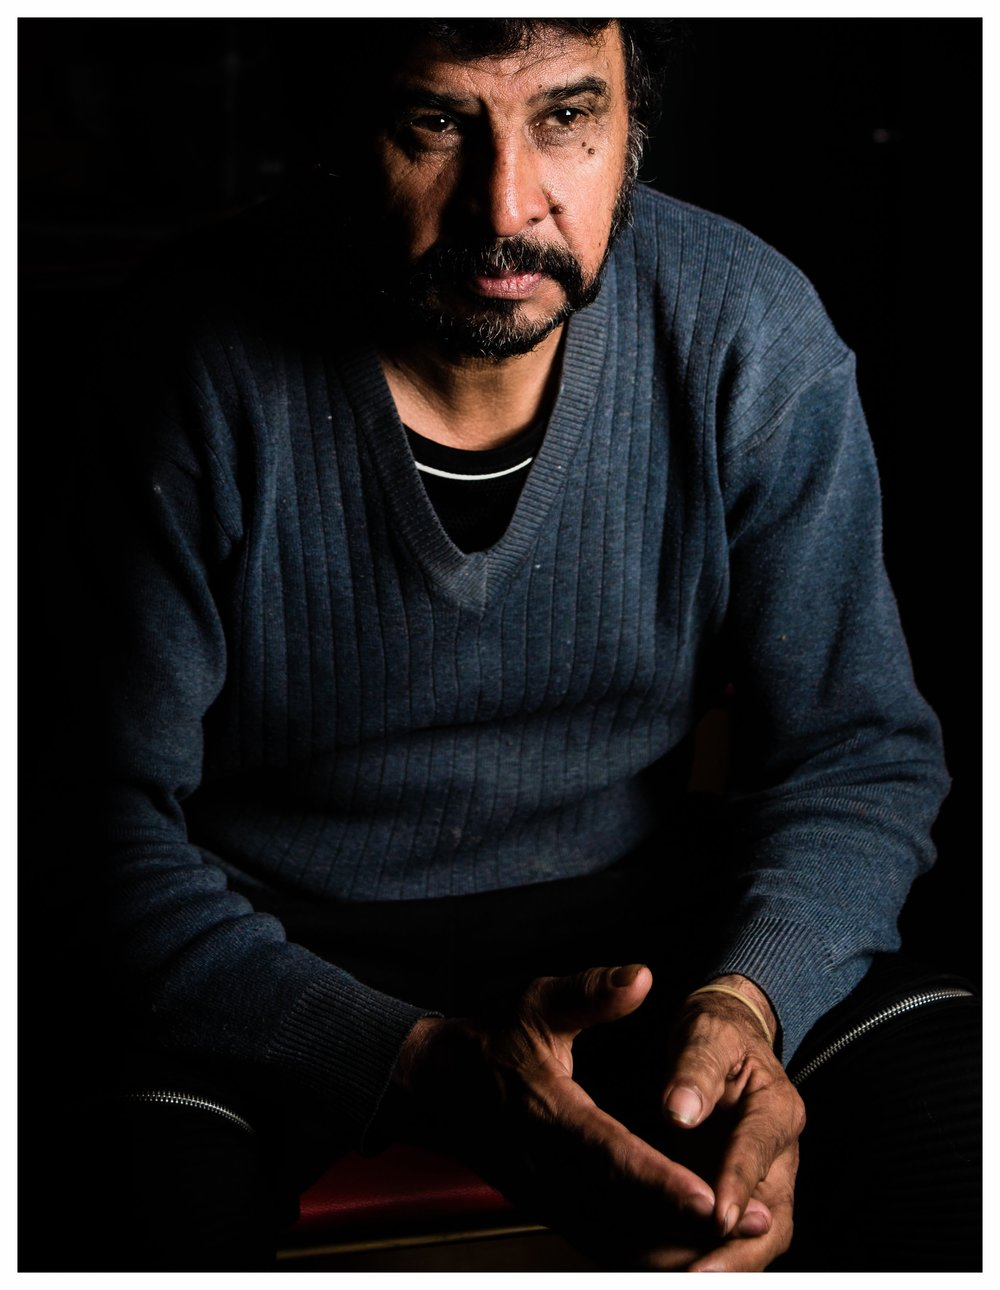 Roberto portrait.jpg